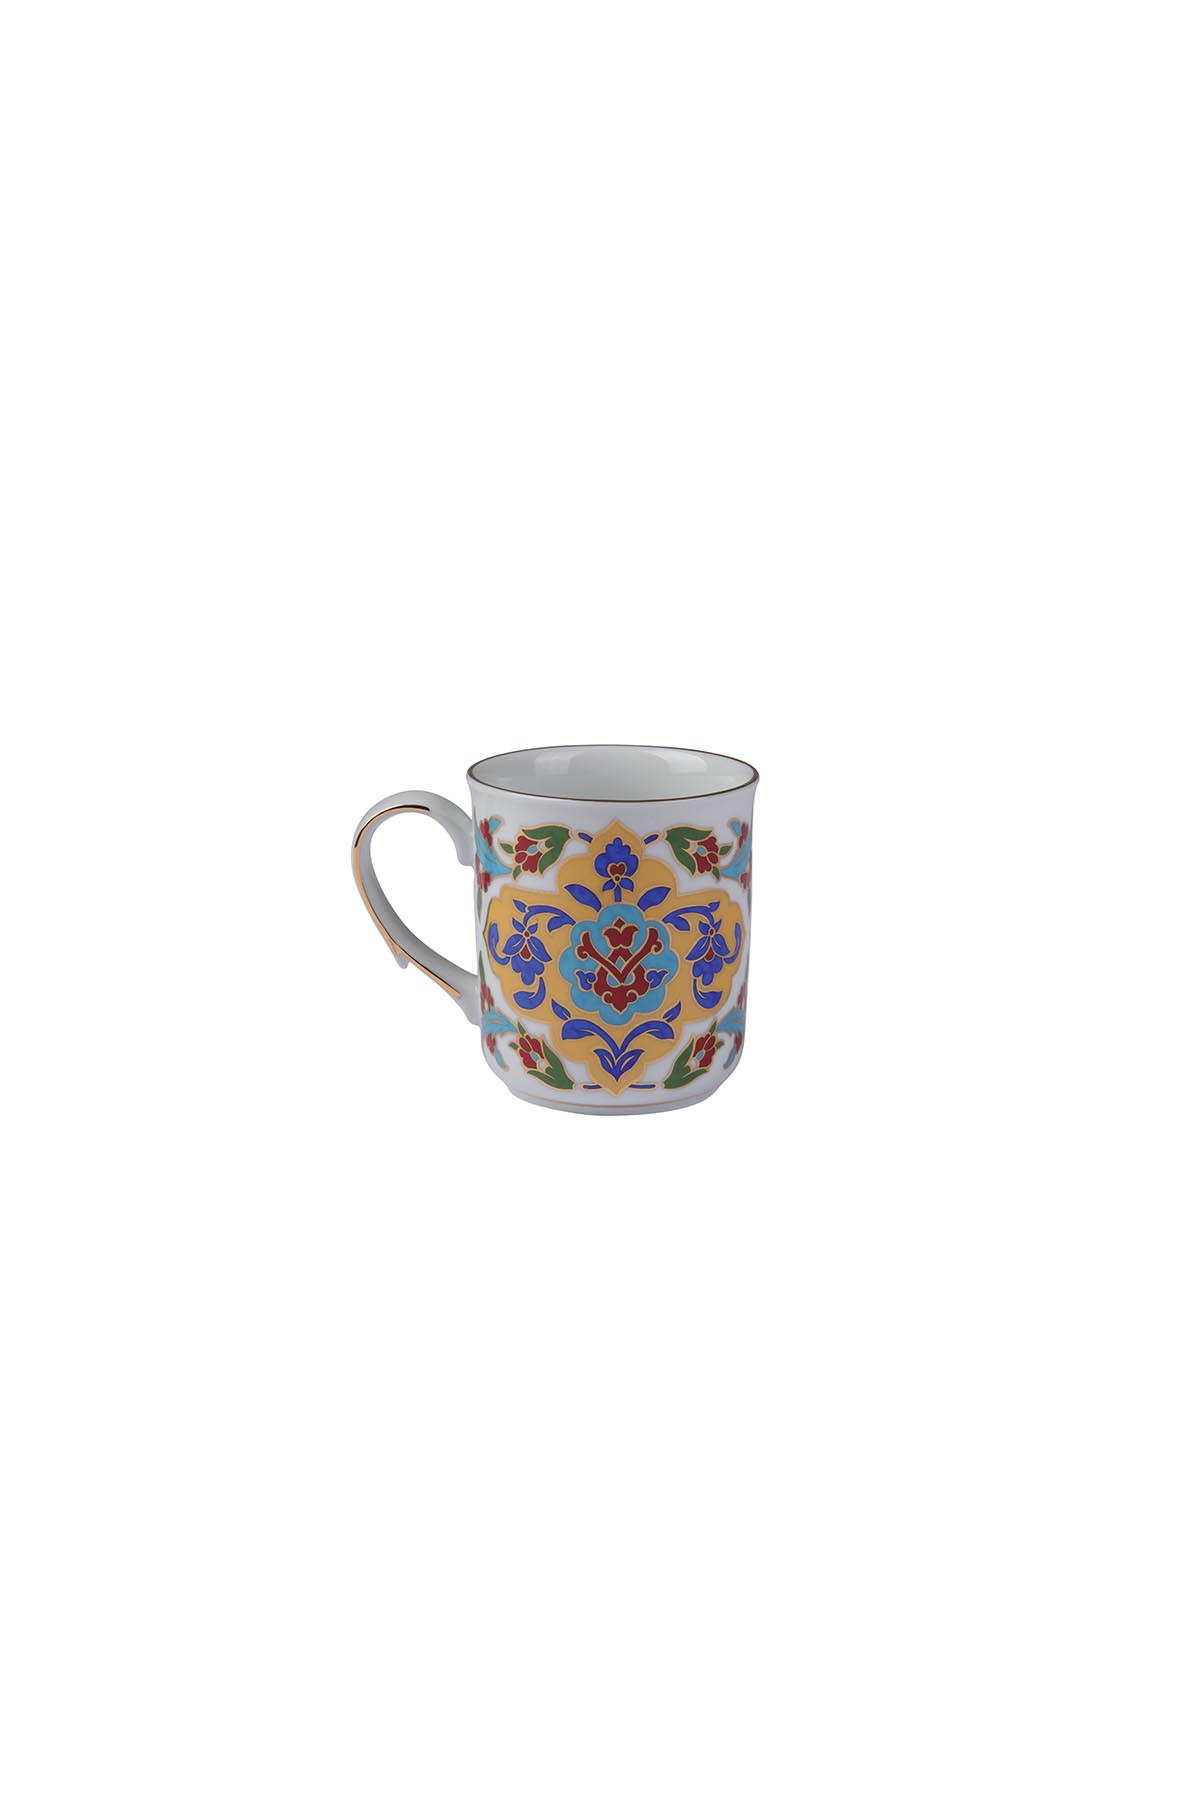 Kütahya Porselen Kupa Bardak Dekor No:690